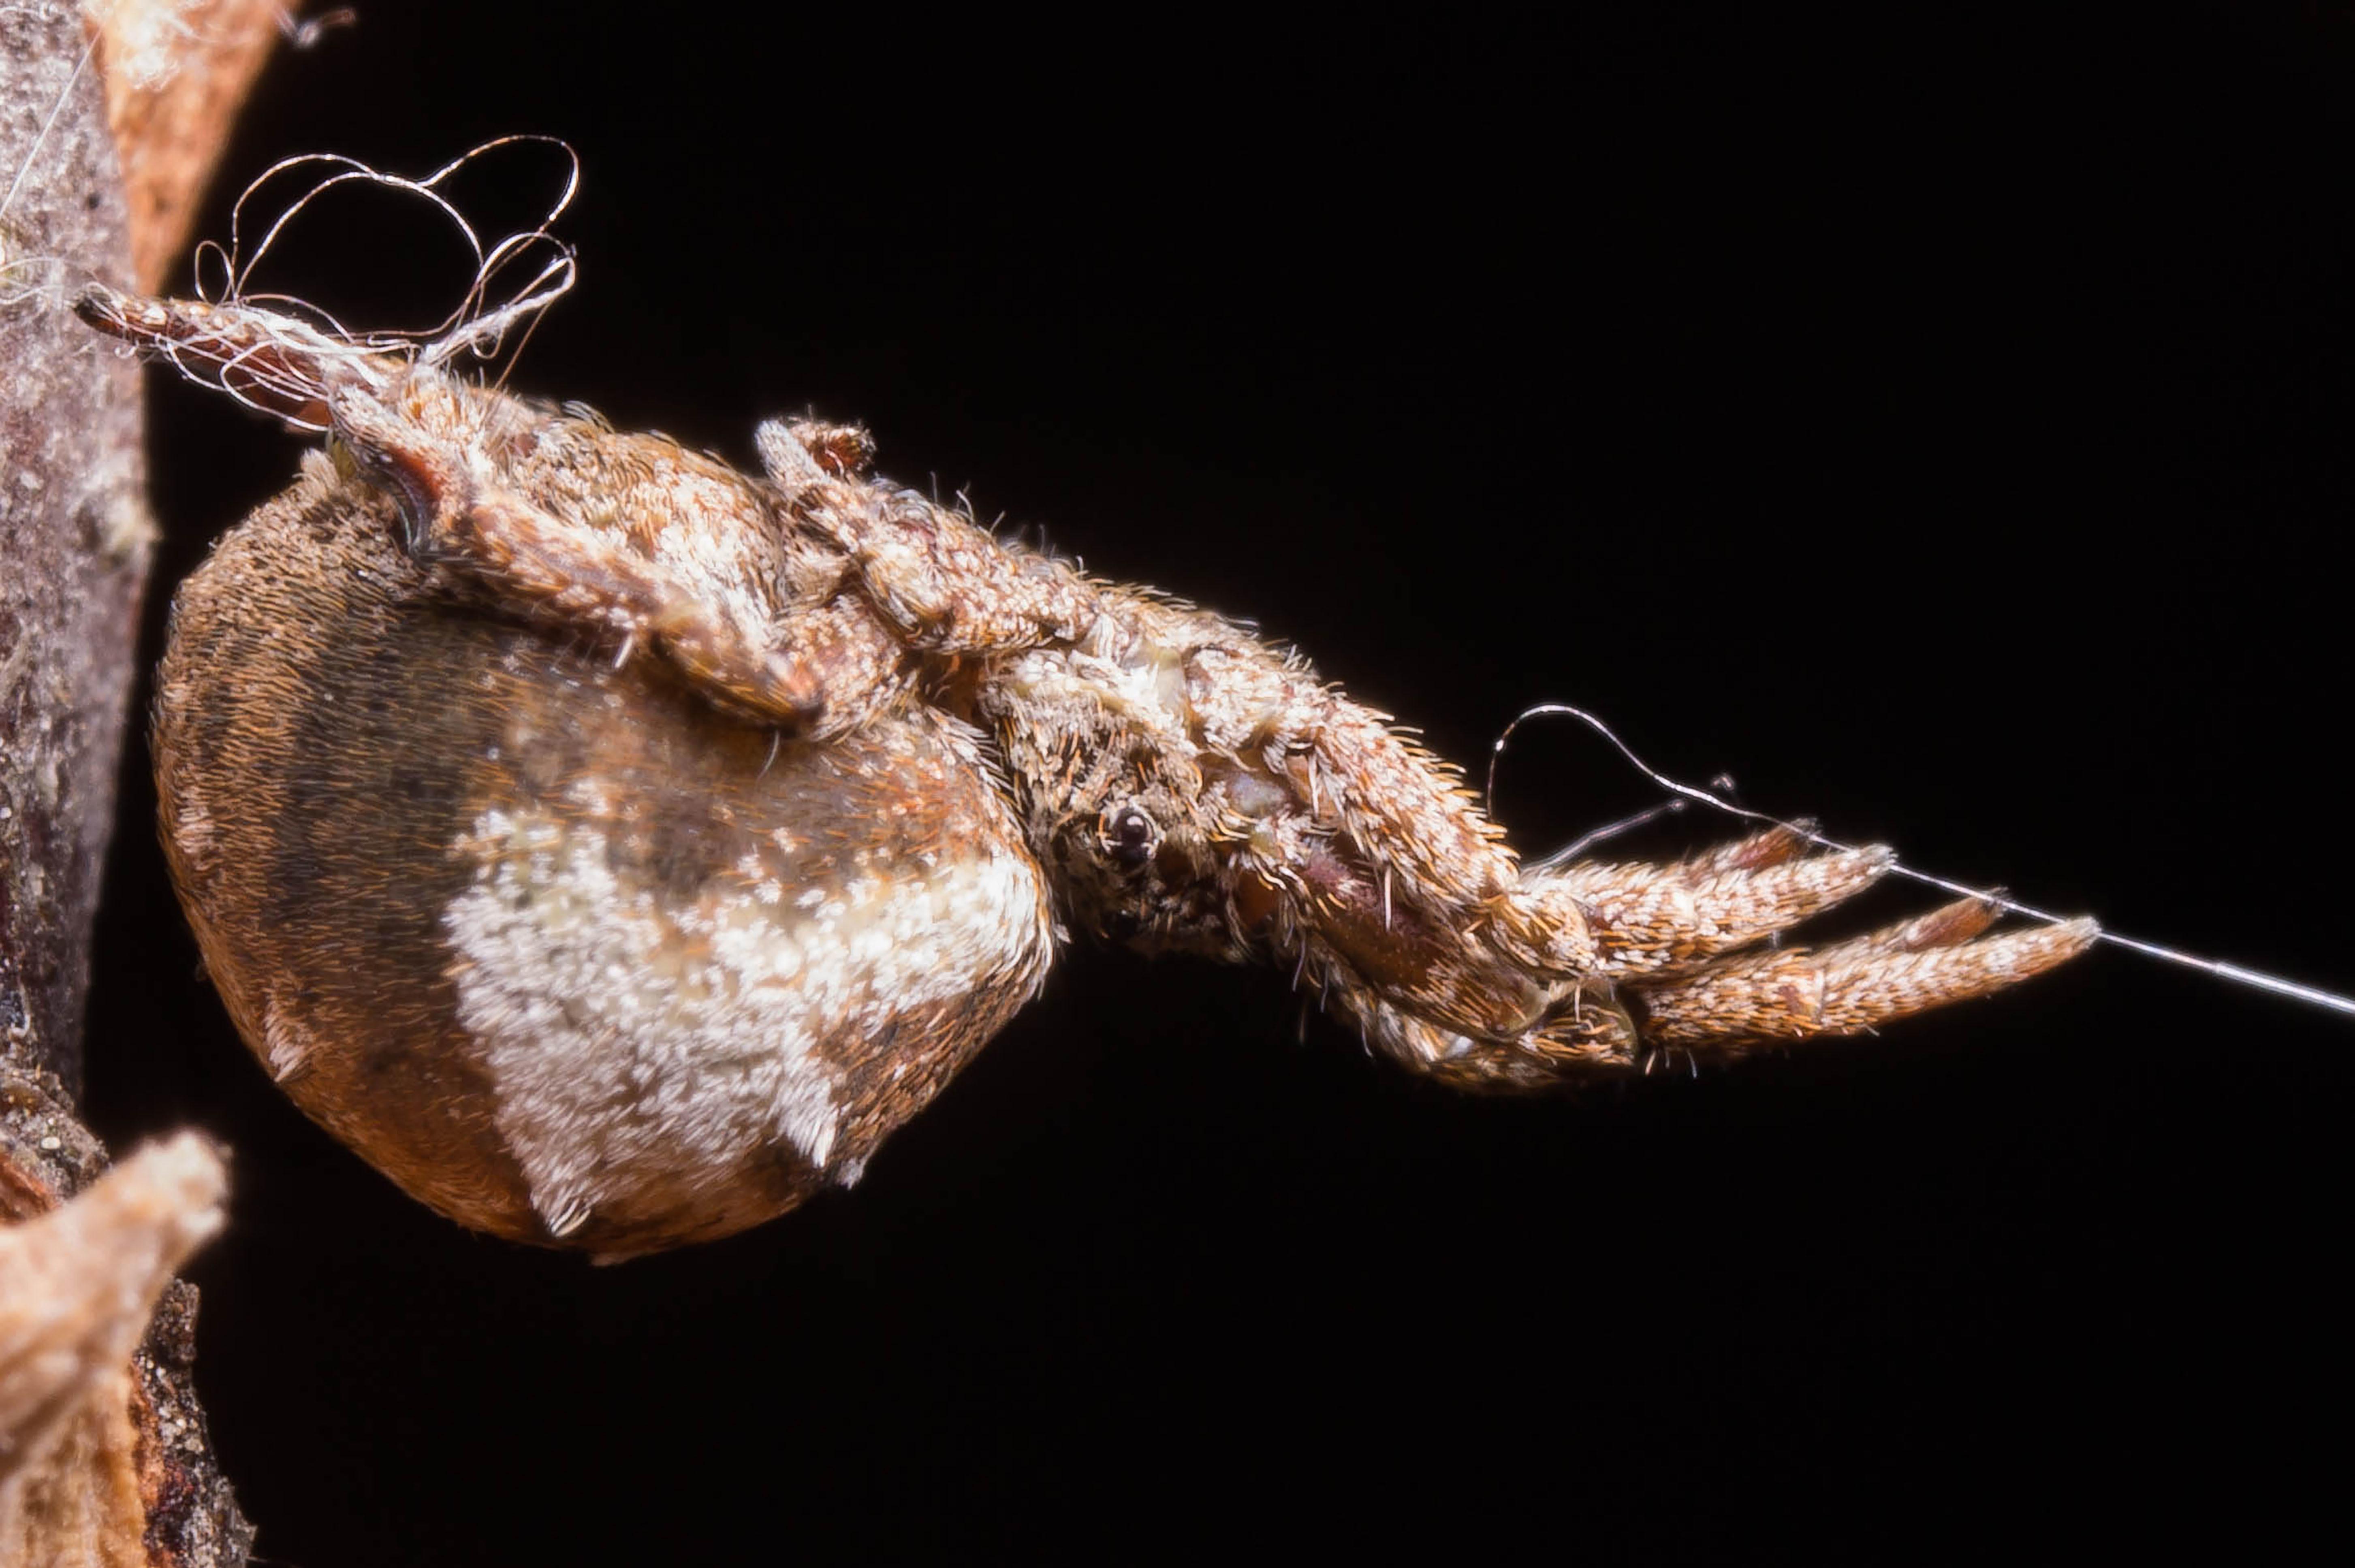 Spider Uses Web As Slingshot To Ensnare Prey, Scientists Find